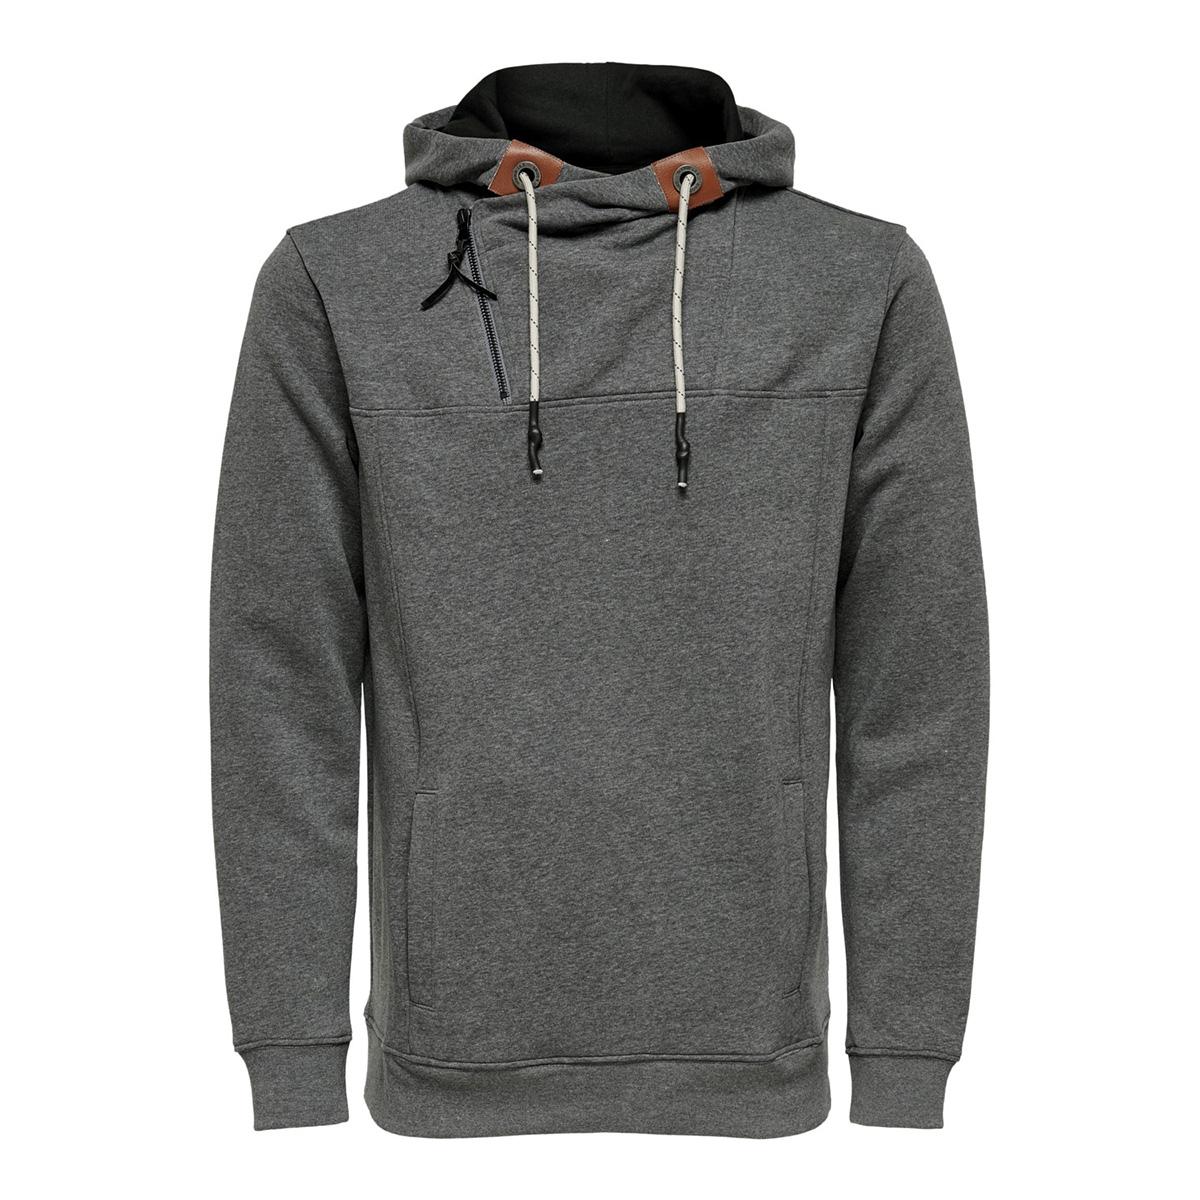 onsmklaus sweat 22014918 only & sons sweater dark grey melange